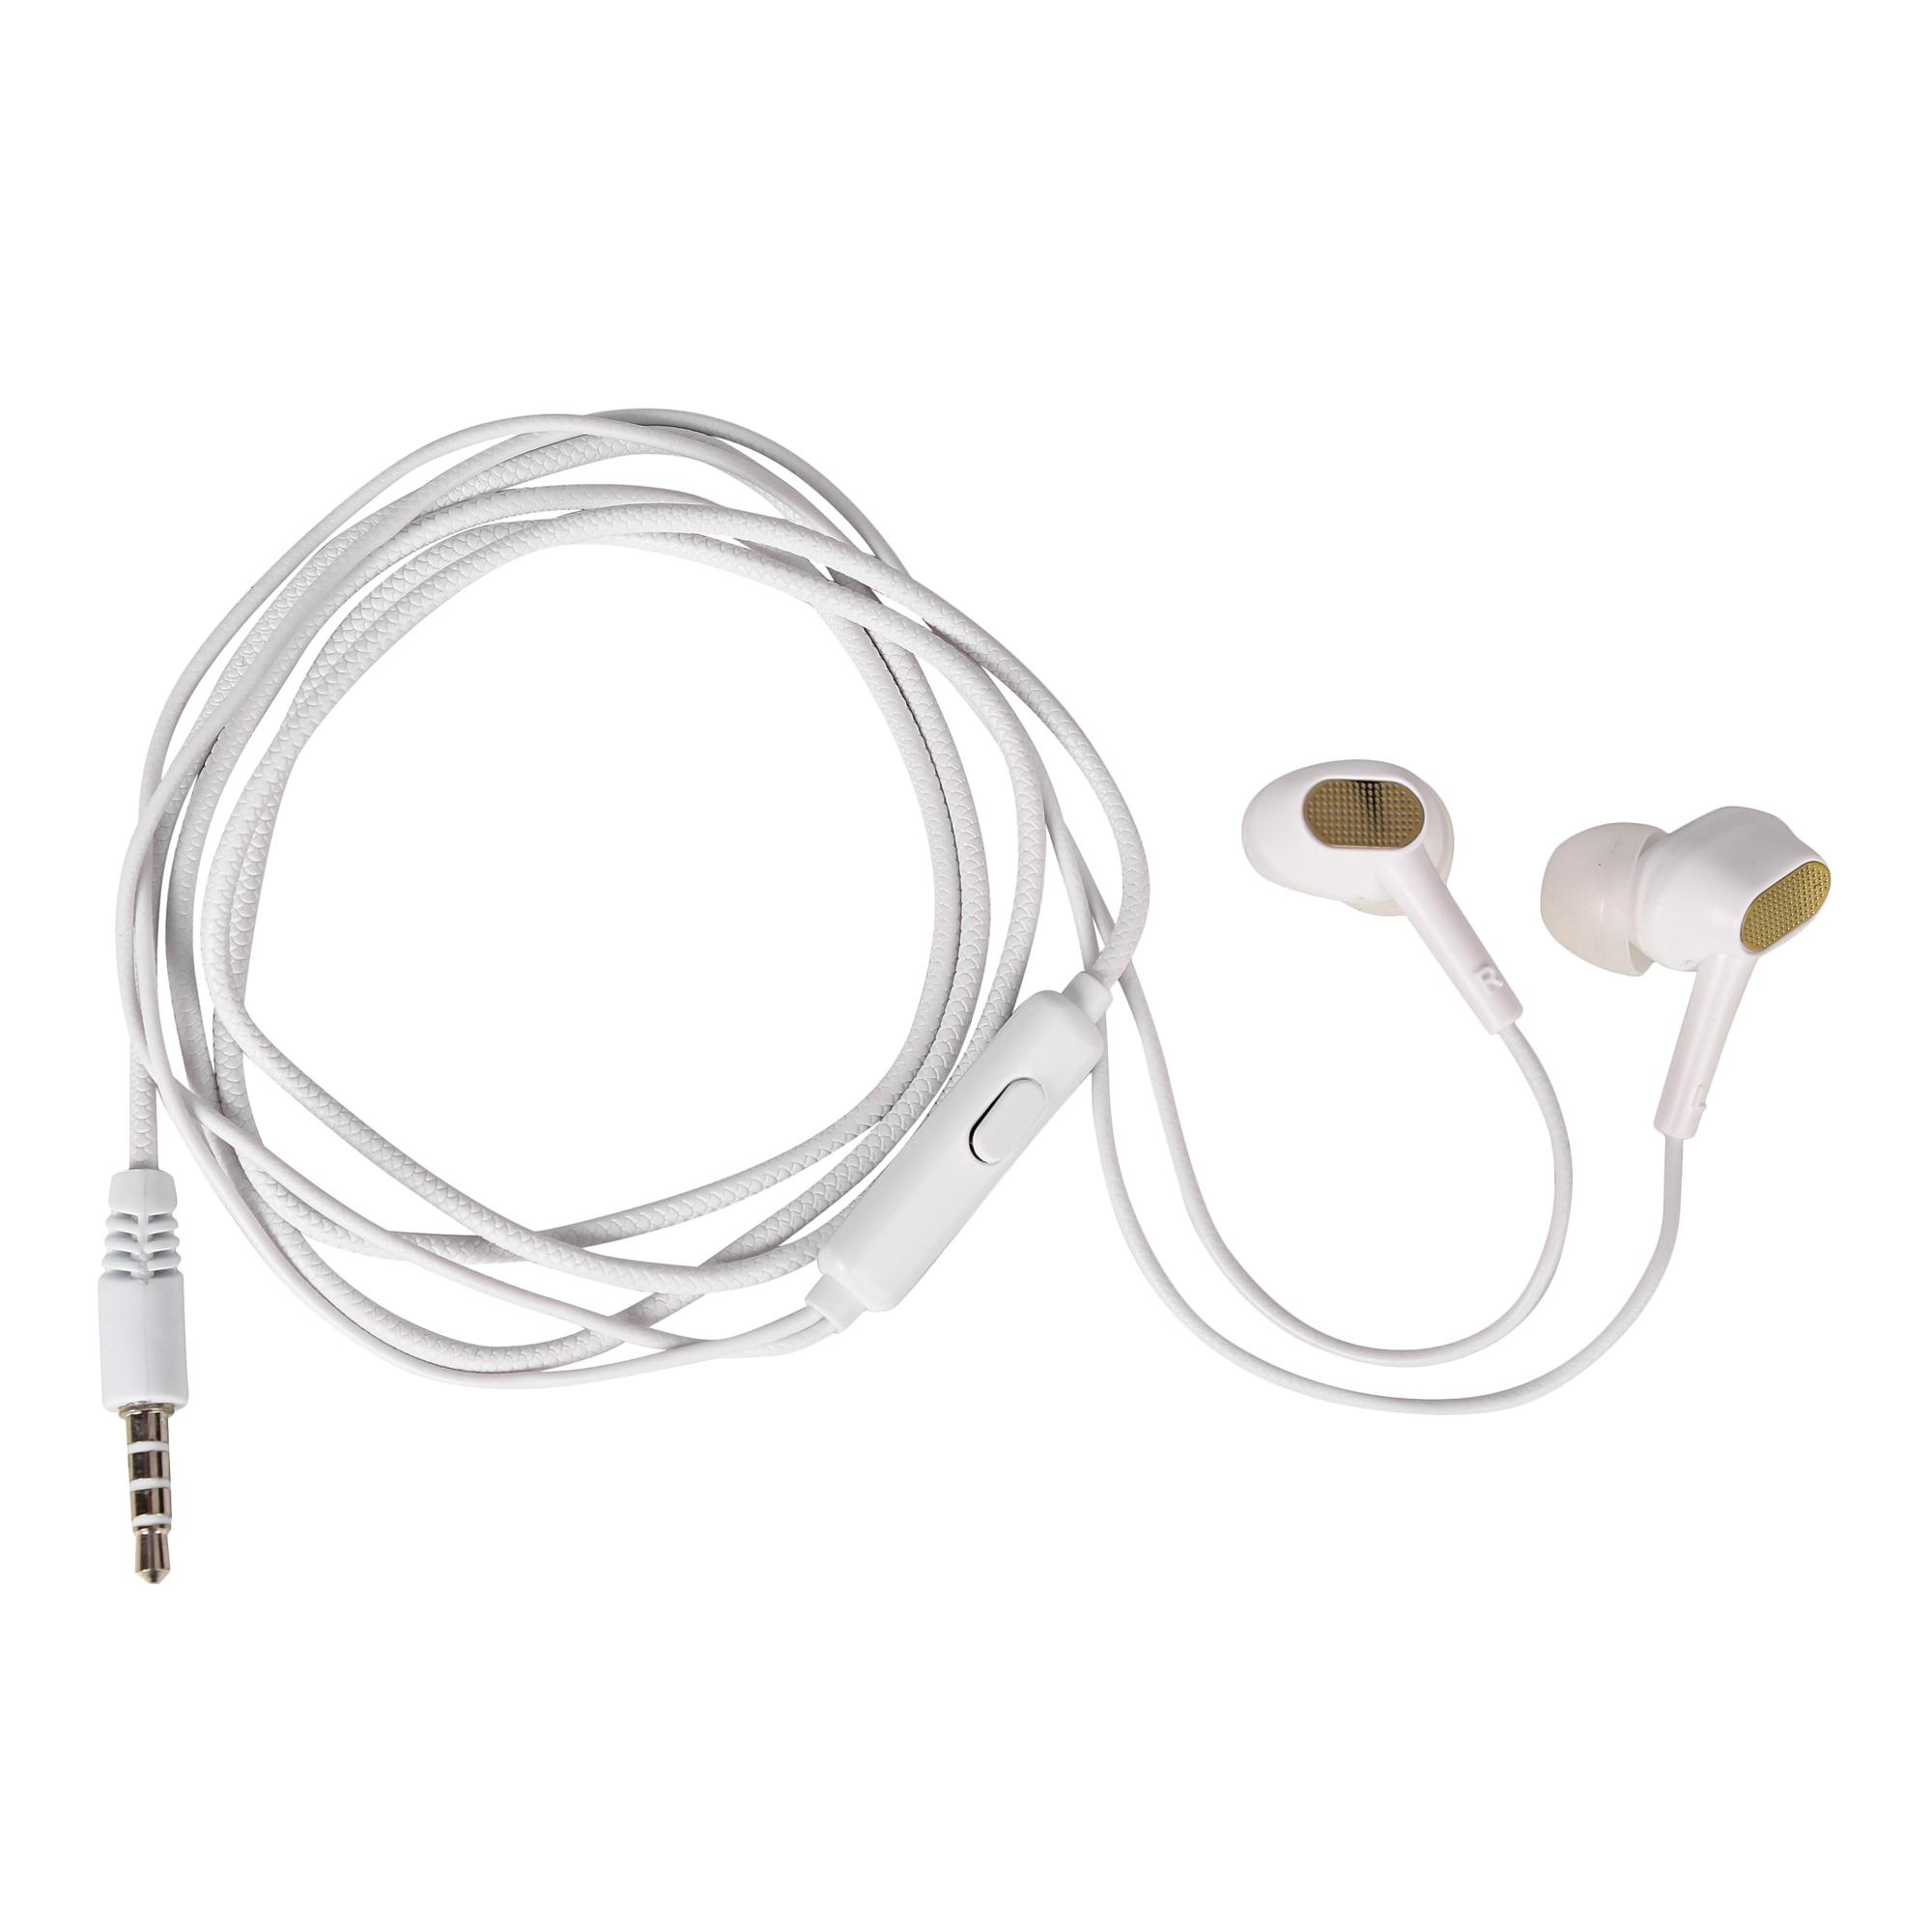 Bluei Shook S4 3.5mm Jack Heavy Bass Superior Sound Stereo Earphone